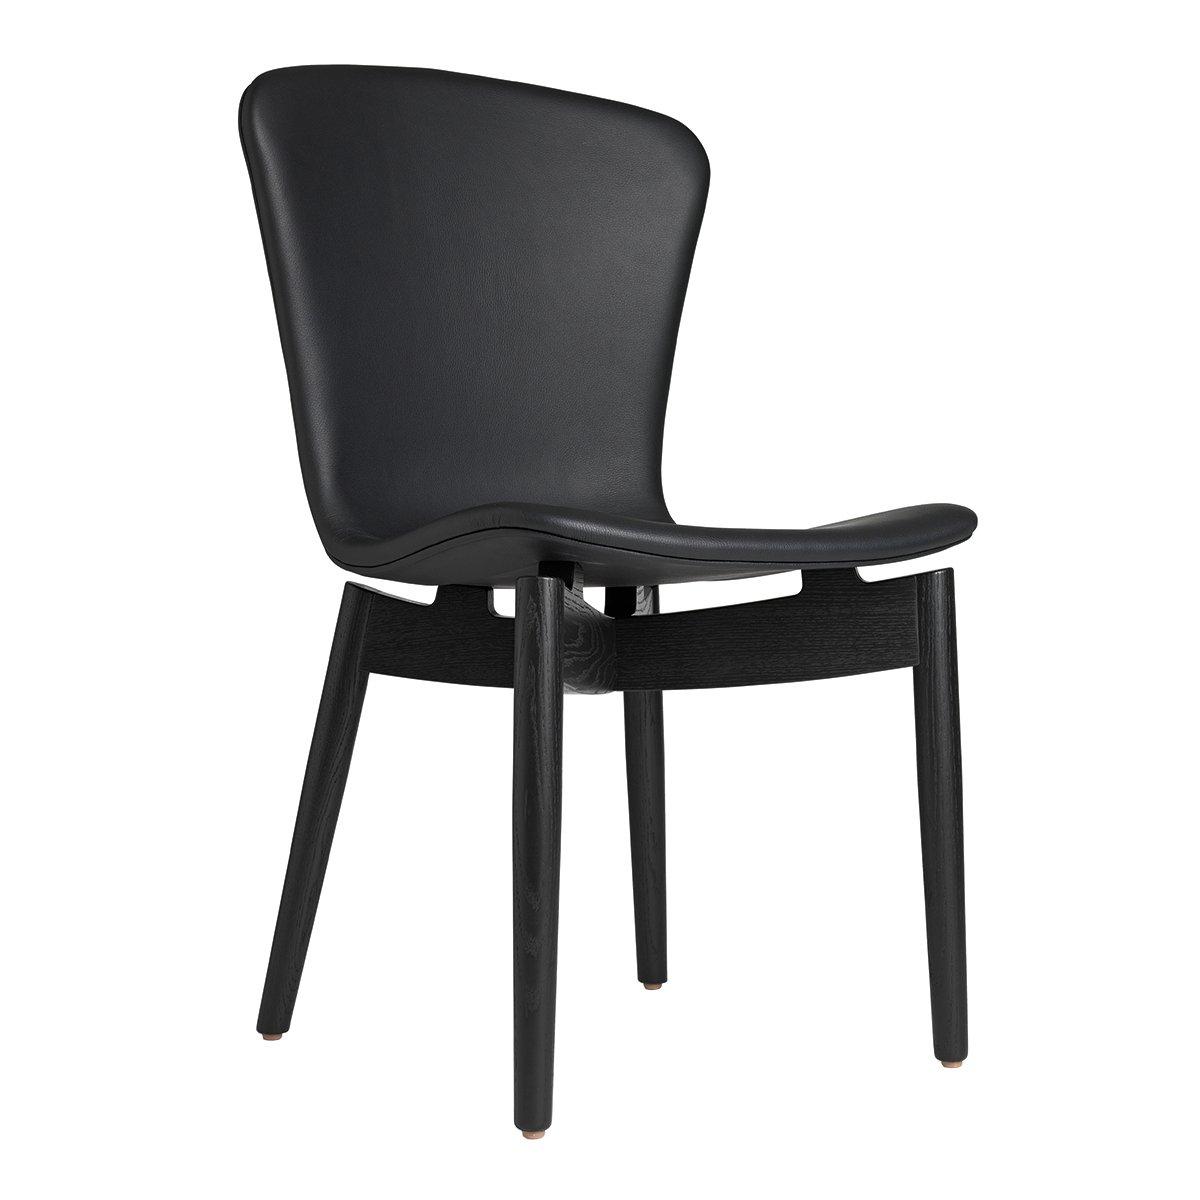 Mater Shell Dining Chair Eetkamerstoel - Ultra Black/Zwart Gebeitst